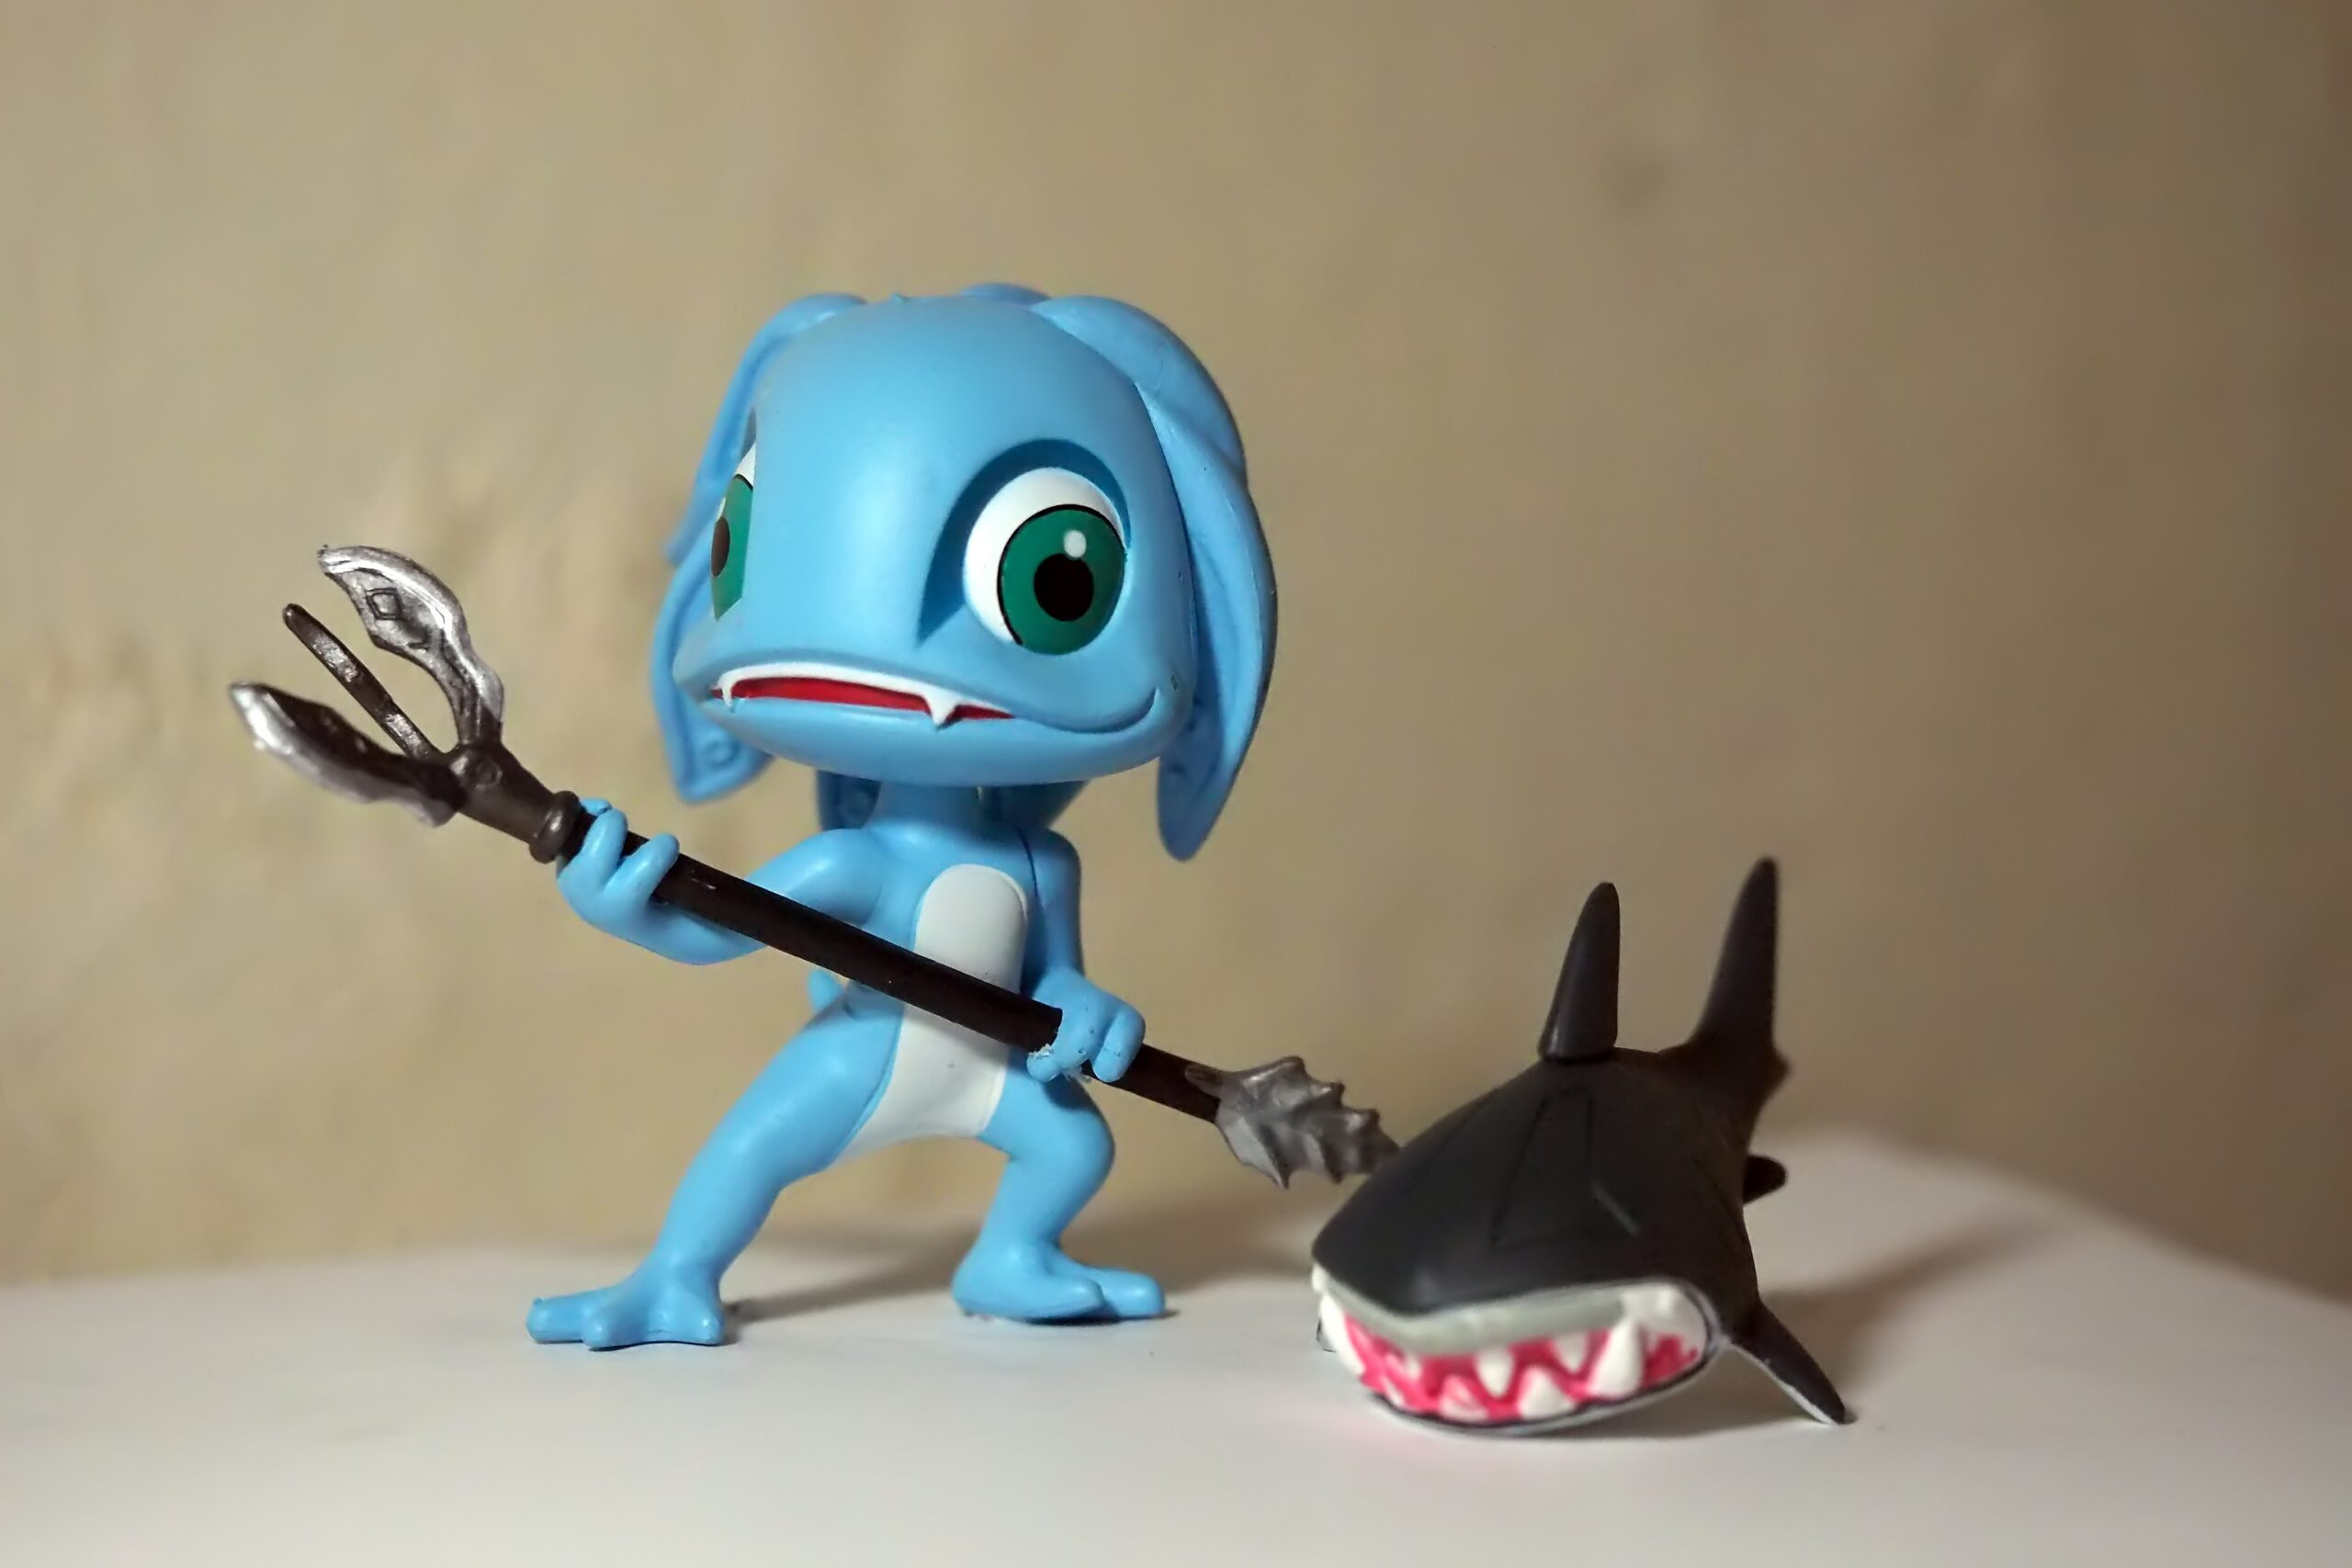 toy, figurine, small